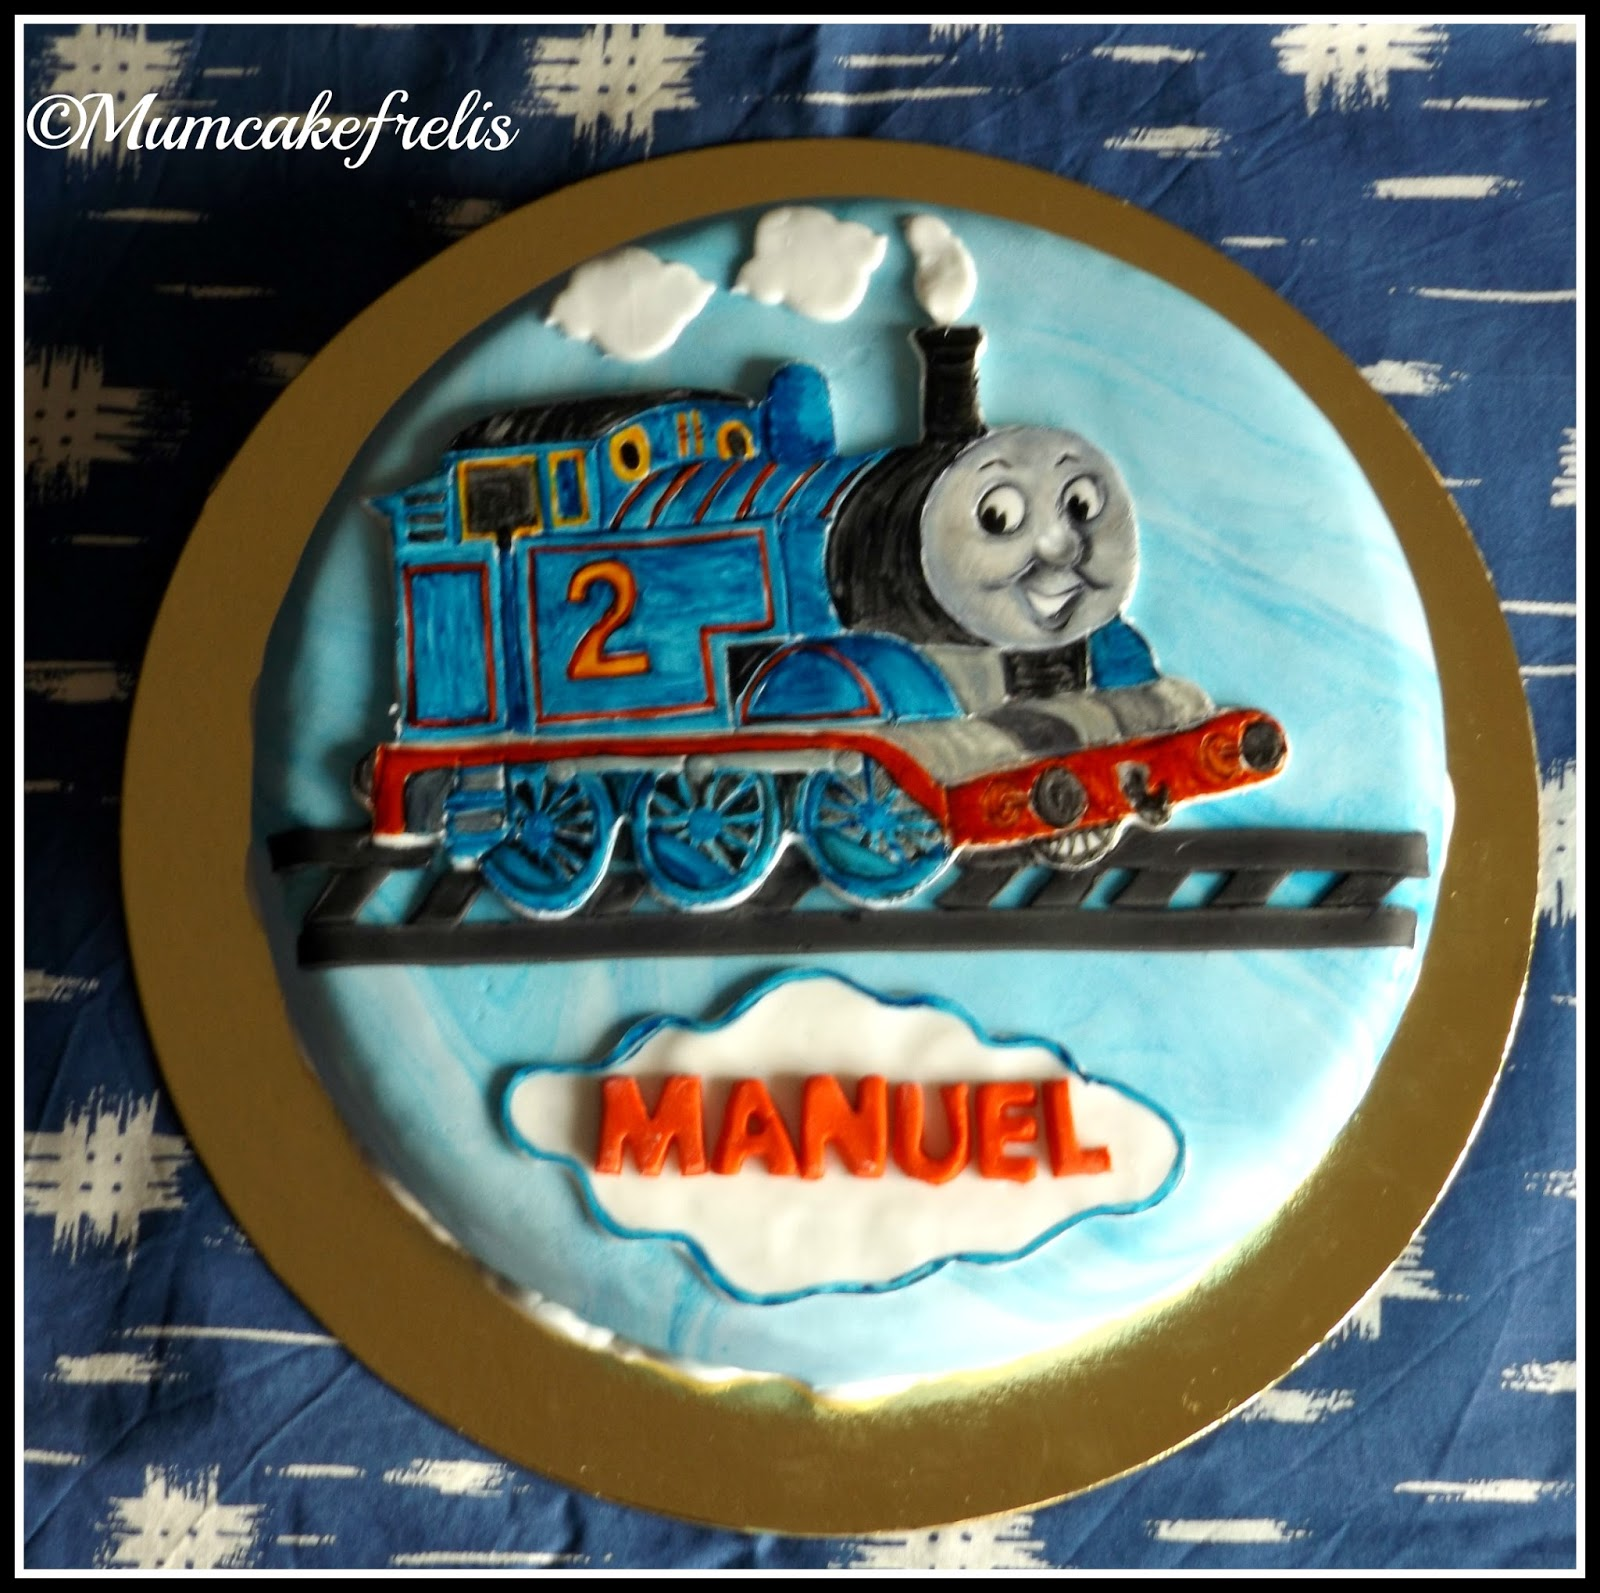 Trenino thomas per i 2 anni di manuel mum cake frelis for Decorazioni torte trenino thomas